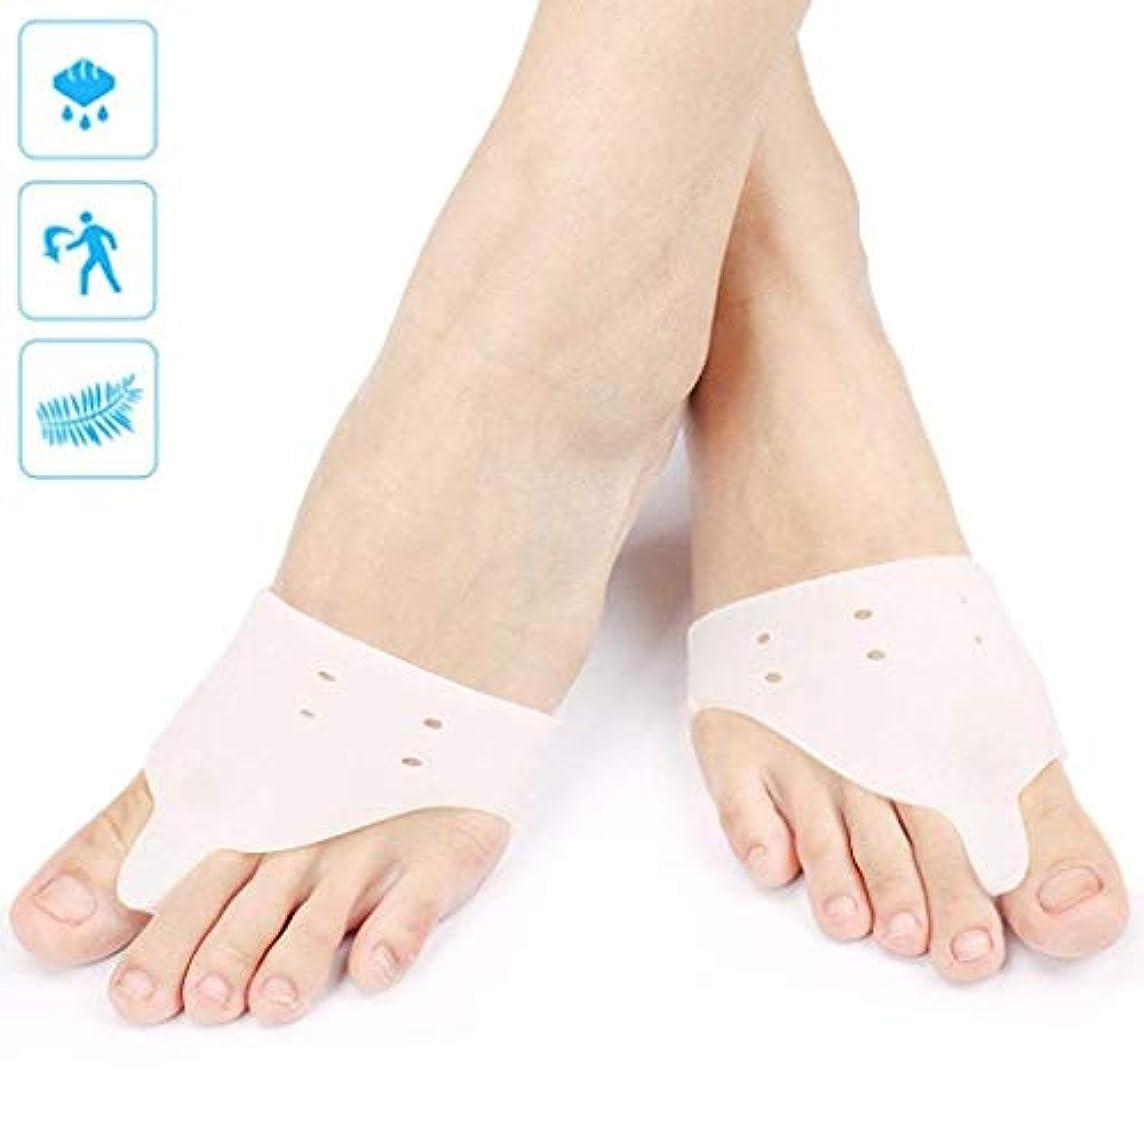 Bunion Toe Separators、Bunion Corrector、Ball of Foot Cushions、Hallux Valgus、Toe Straighteners、Bunion Protector